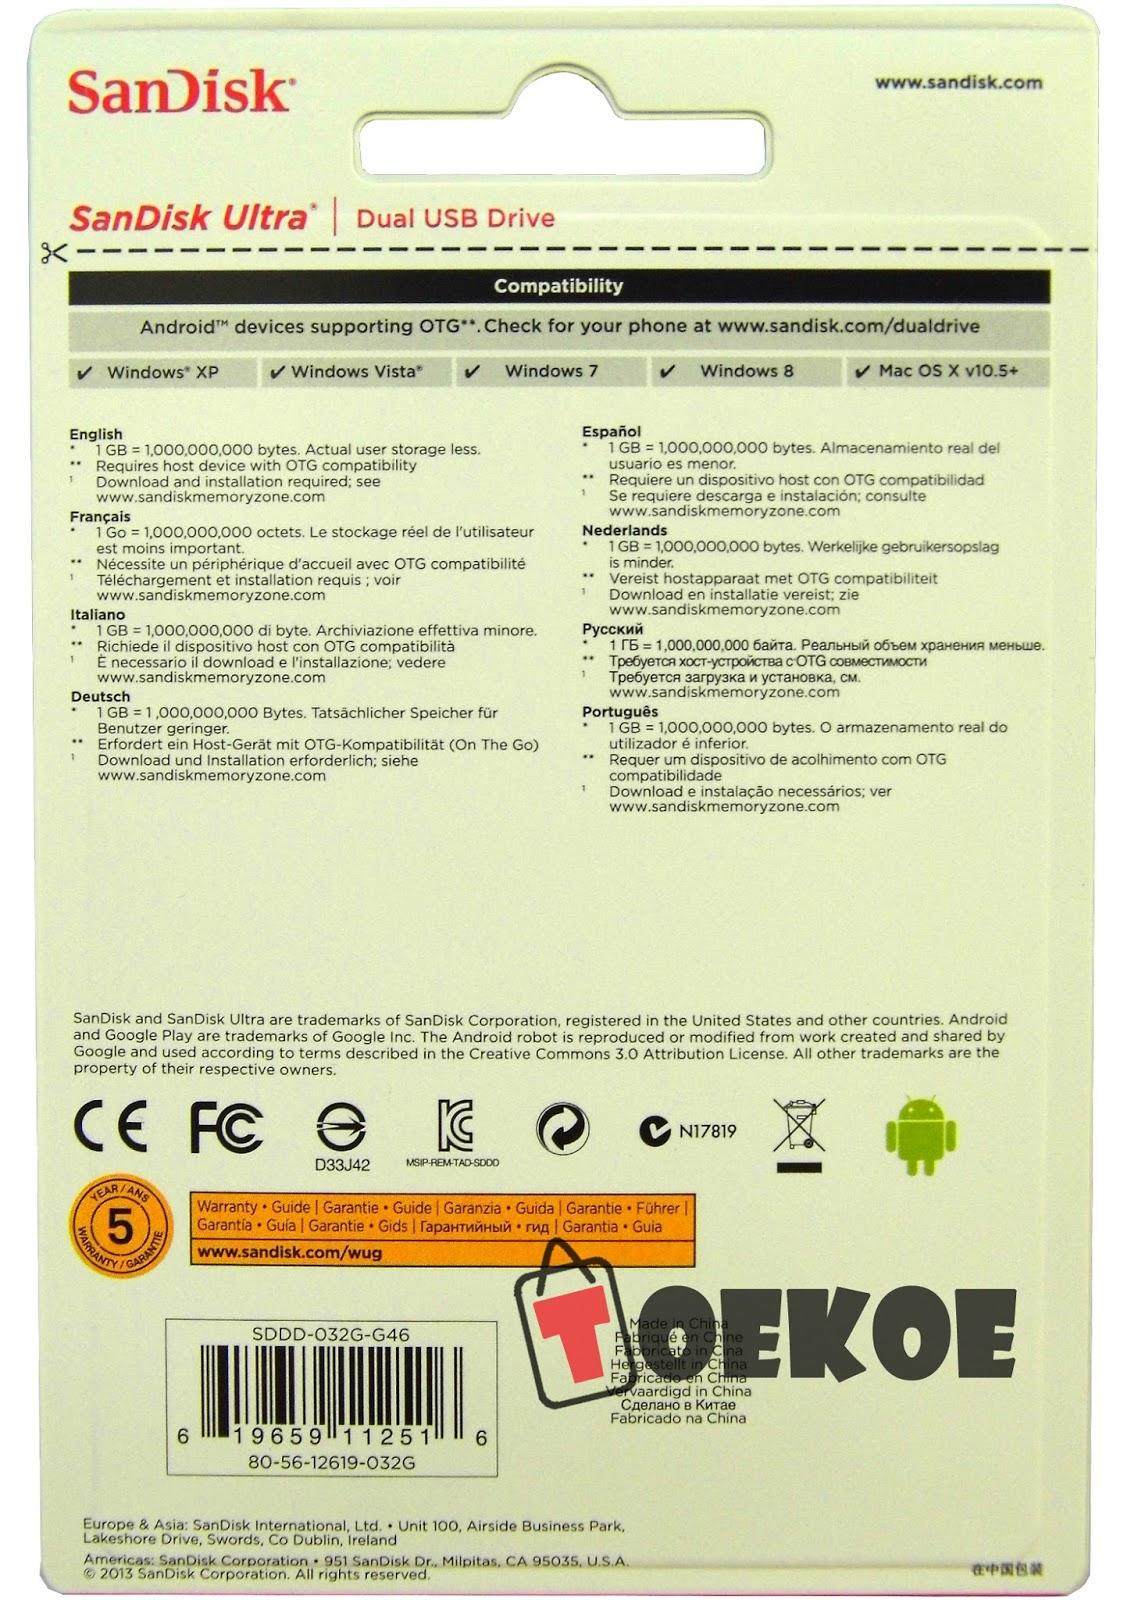 Toekoe Surabaya Flashdisk Otg Sandisk Ultra Dual Usb Drive 16 Gb Flasdisk 16gb Garansi Resmi Dari Astrindo Selama 5 Tahun Sesuai Yang Tertera Dibelakang Kemasan